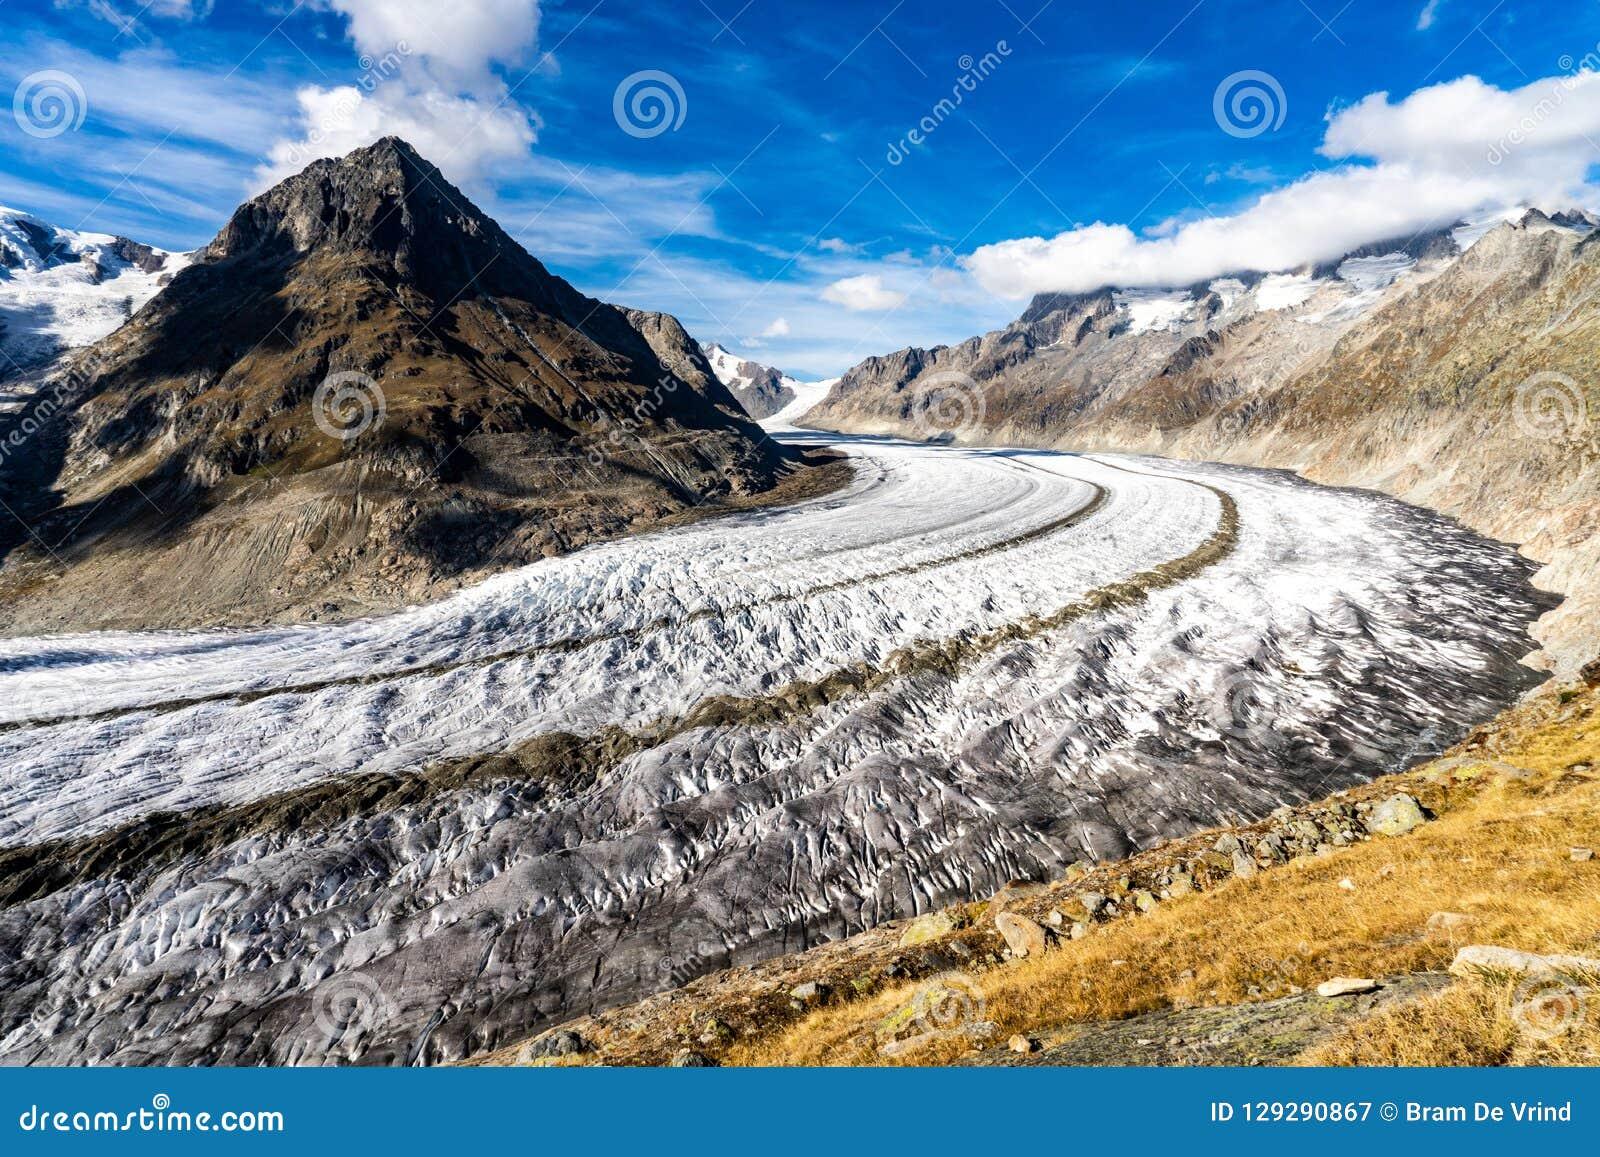 Aletsch Glacier in the Alps in Switzerland